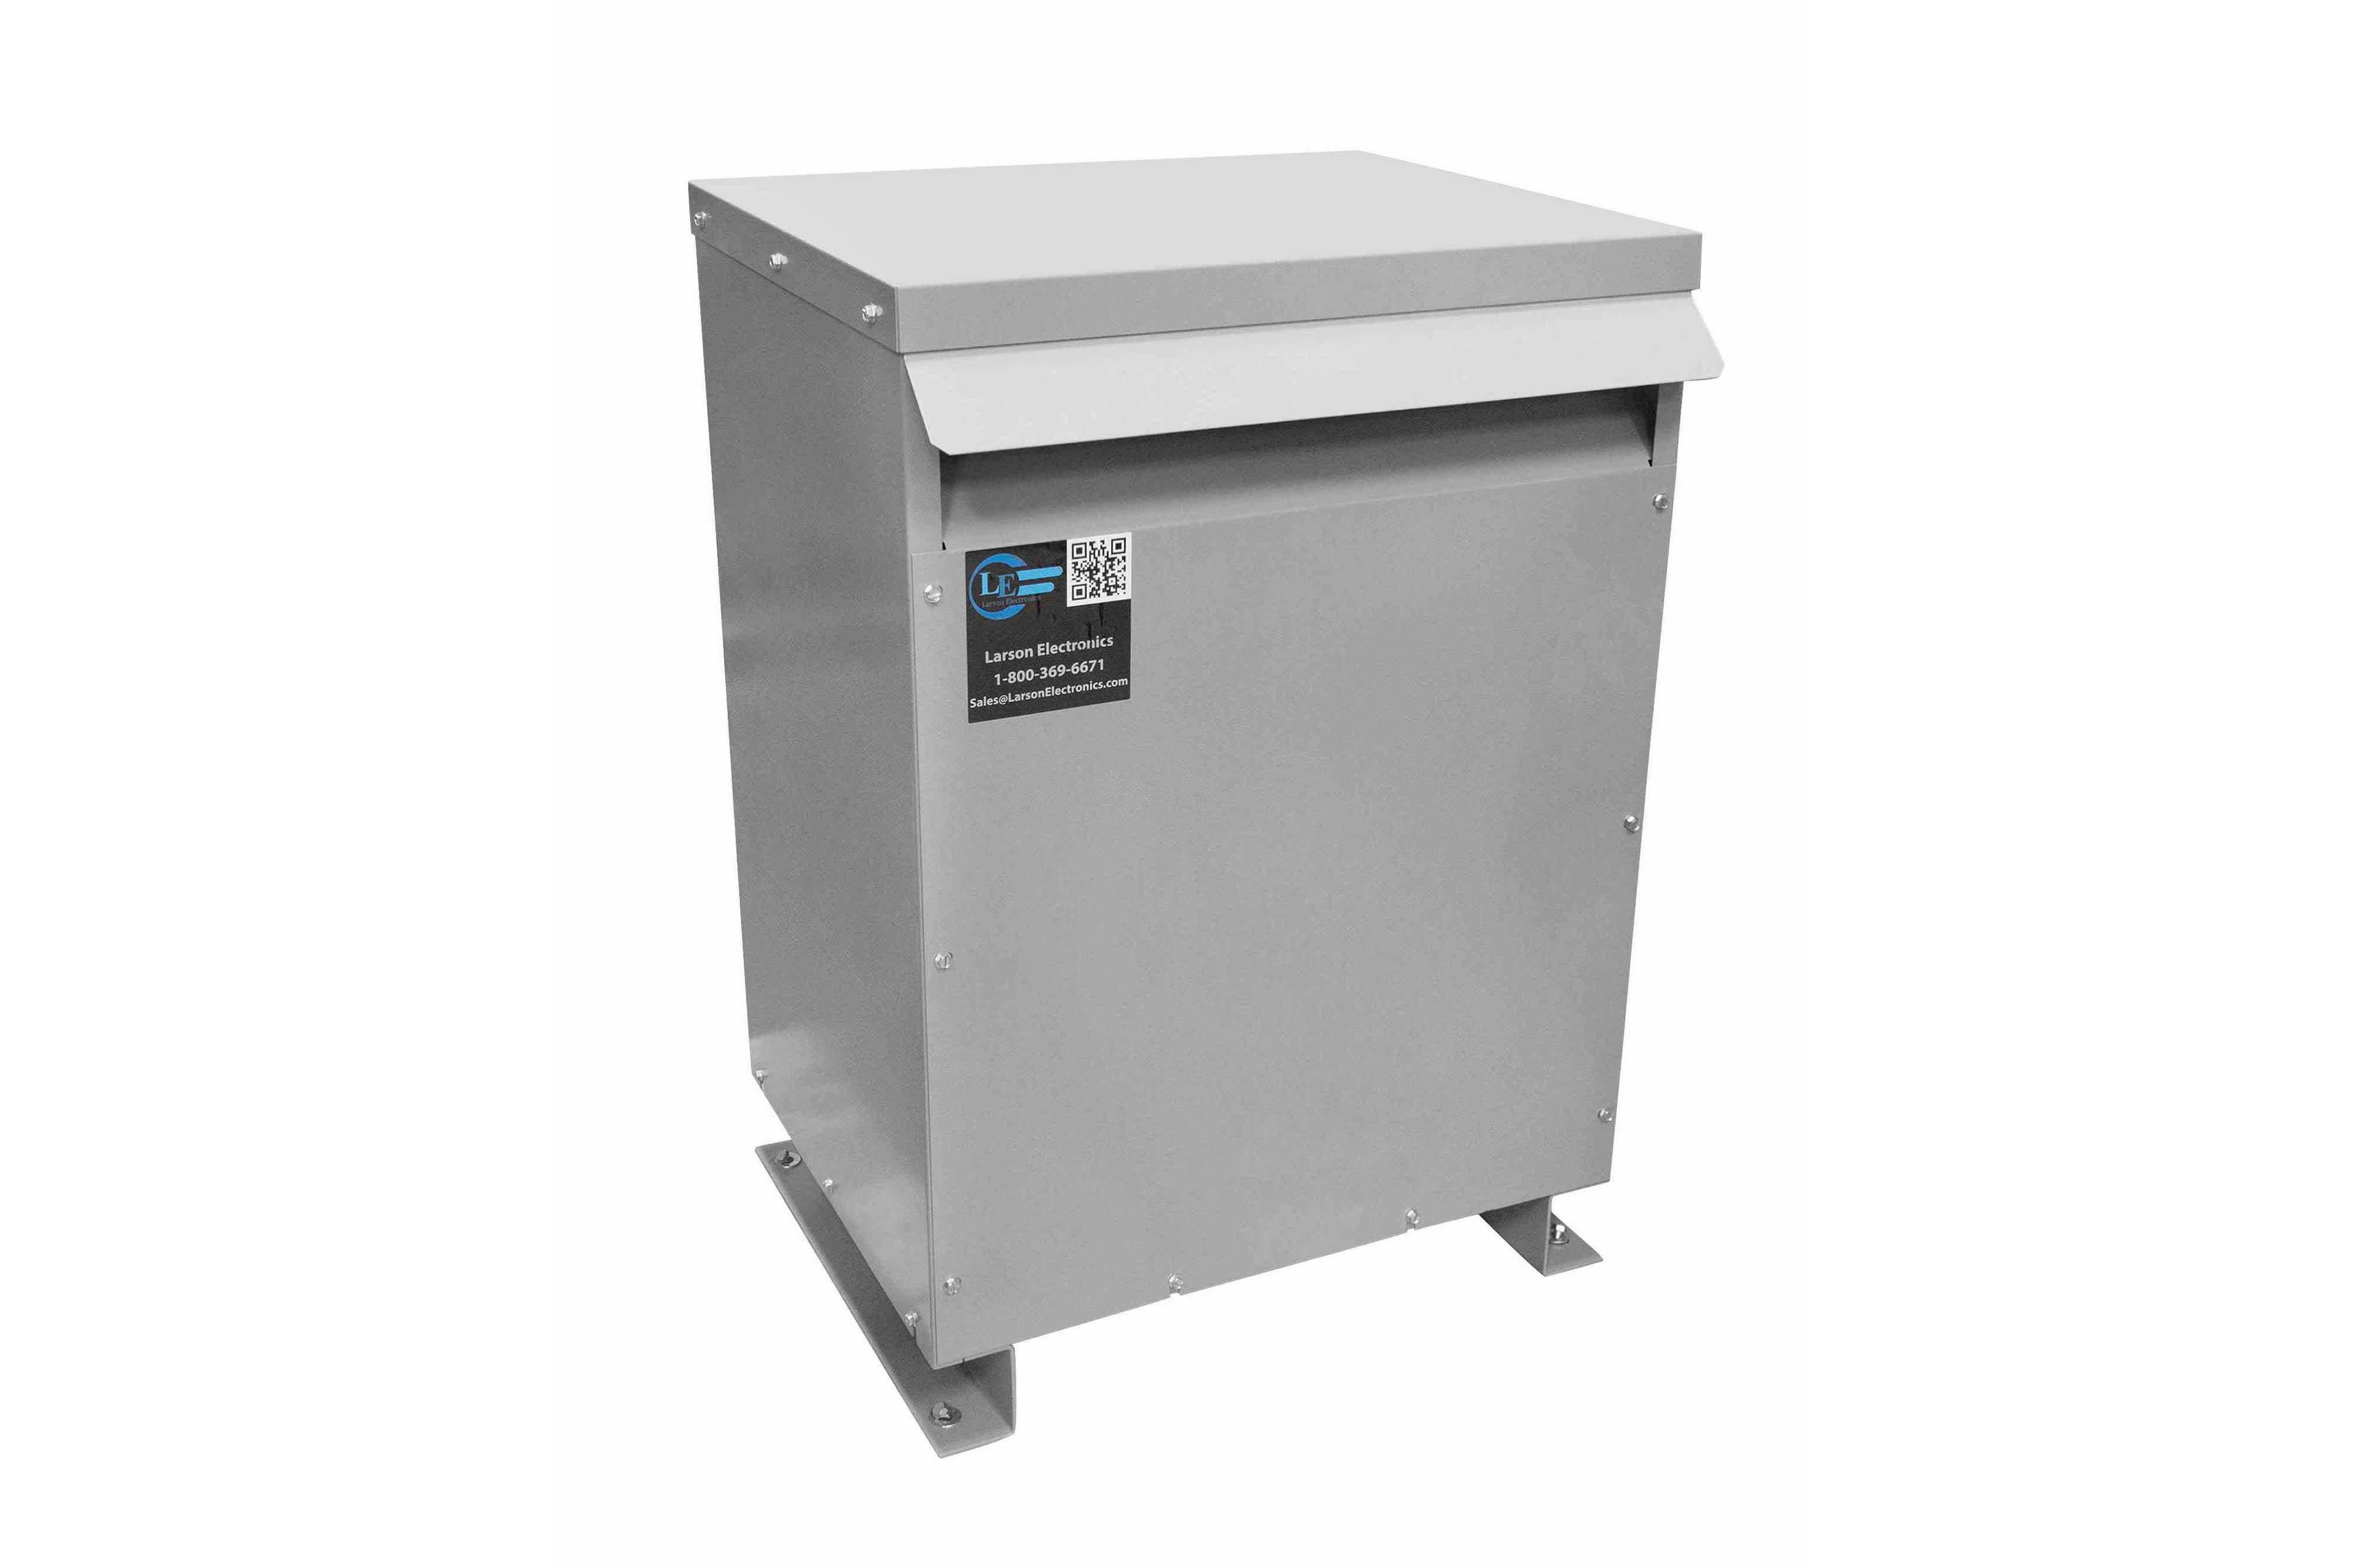 80 kVA 3PH Isolation Transformer, 415V Wye Primary, 240V/120 Delta Secondary, N3R, Ventilated, 60 Hz